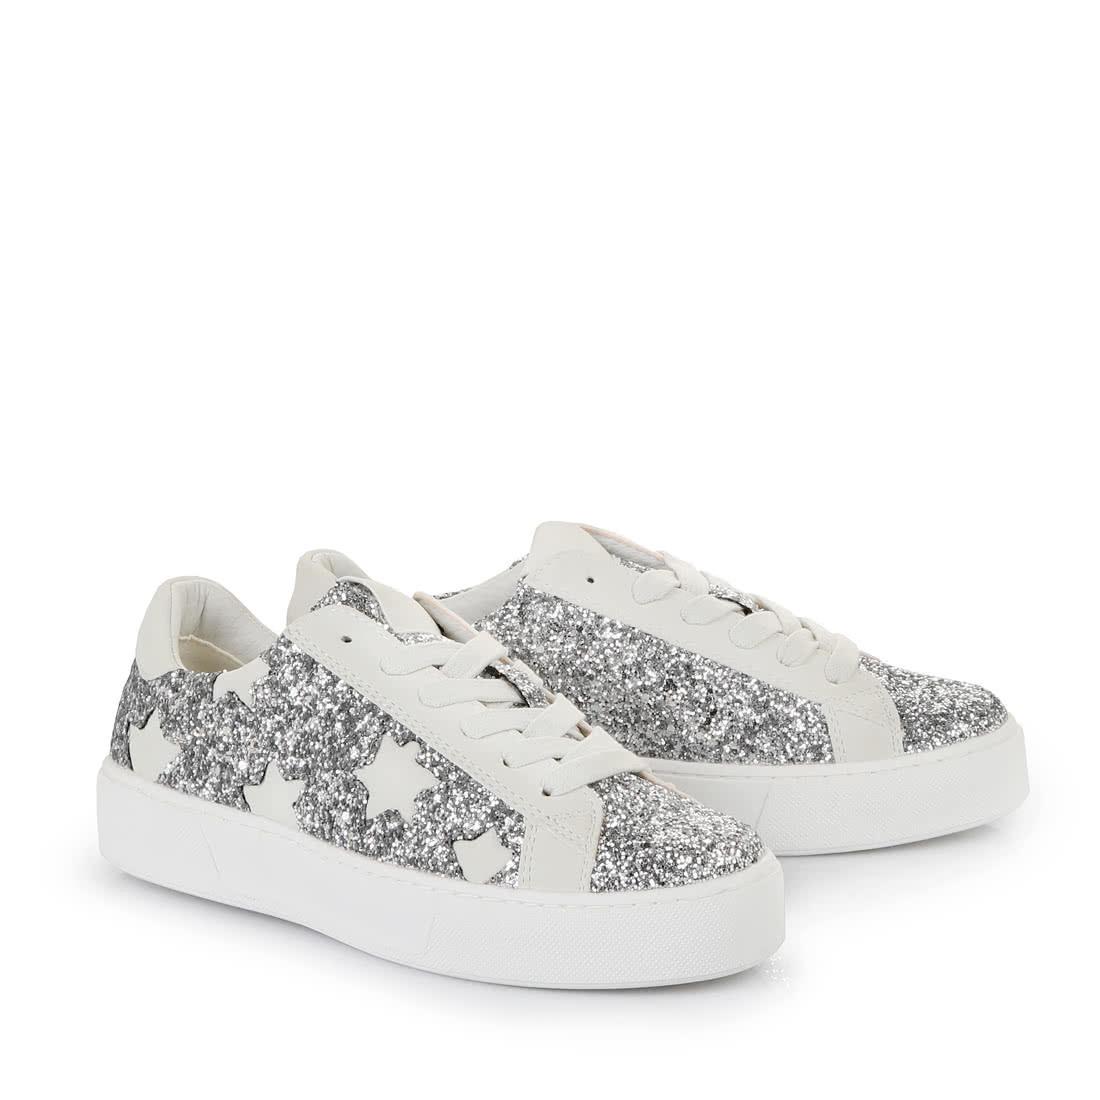 new product f6736 2bf5a Buffalo Plateau-Sneaker in weiß/silber glitzer online kaufen ...